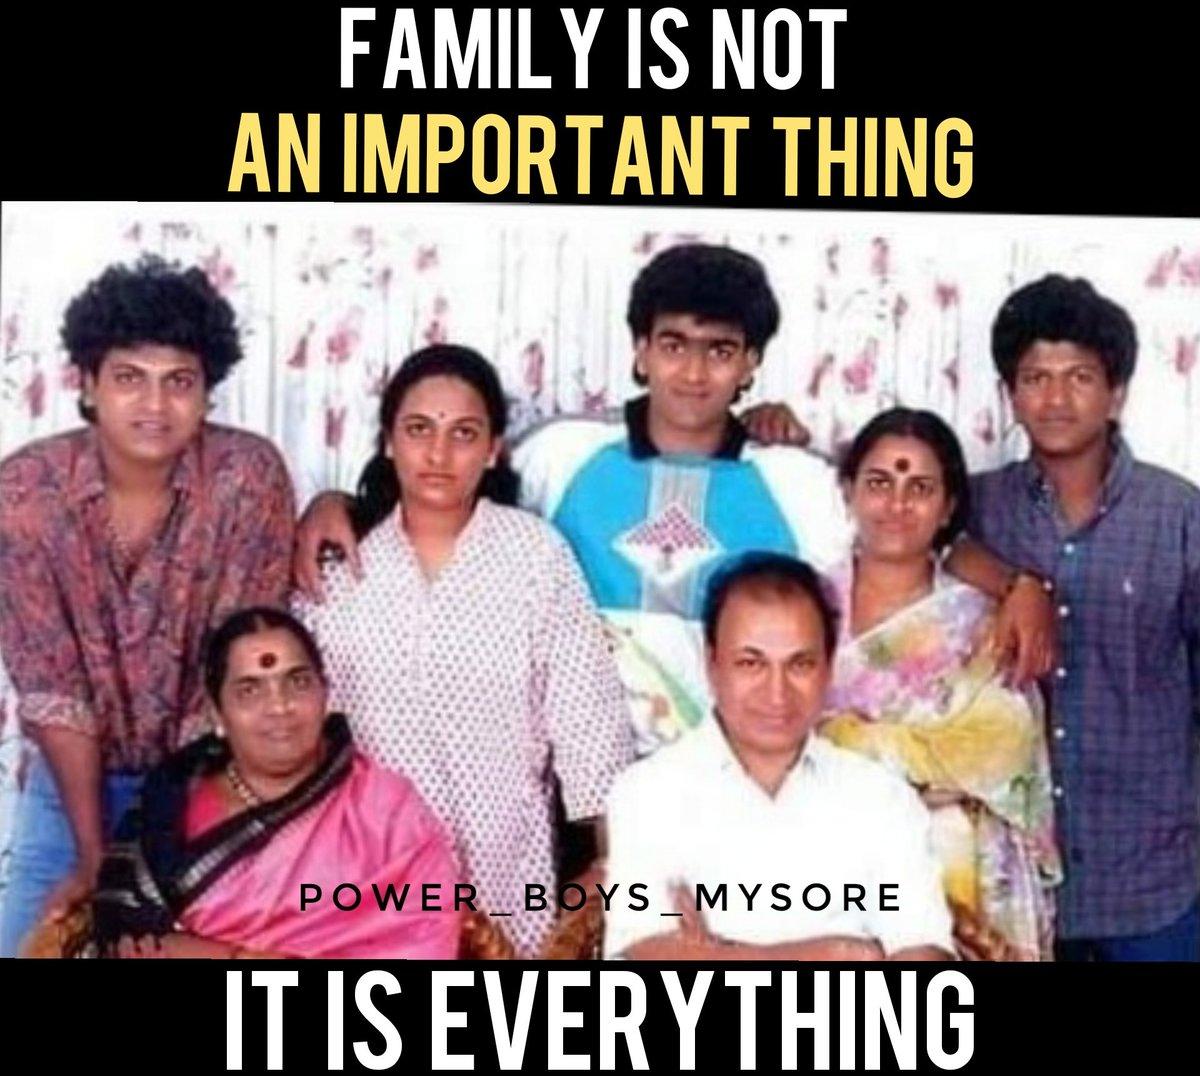 The Rajkumars🙏❤ #TheRajkumars#Annavaru #DrRajkumar #ParvathammaRajkumar#BossOfSandalwood #HatrickHero#CenturyStar#DrShivanna #DrShivaRajkumar#RaghavendraRajkumar#Appu #PowerStar#PuneethRajkumar#PowerBoysMysore